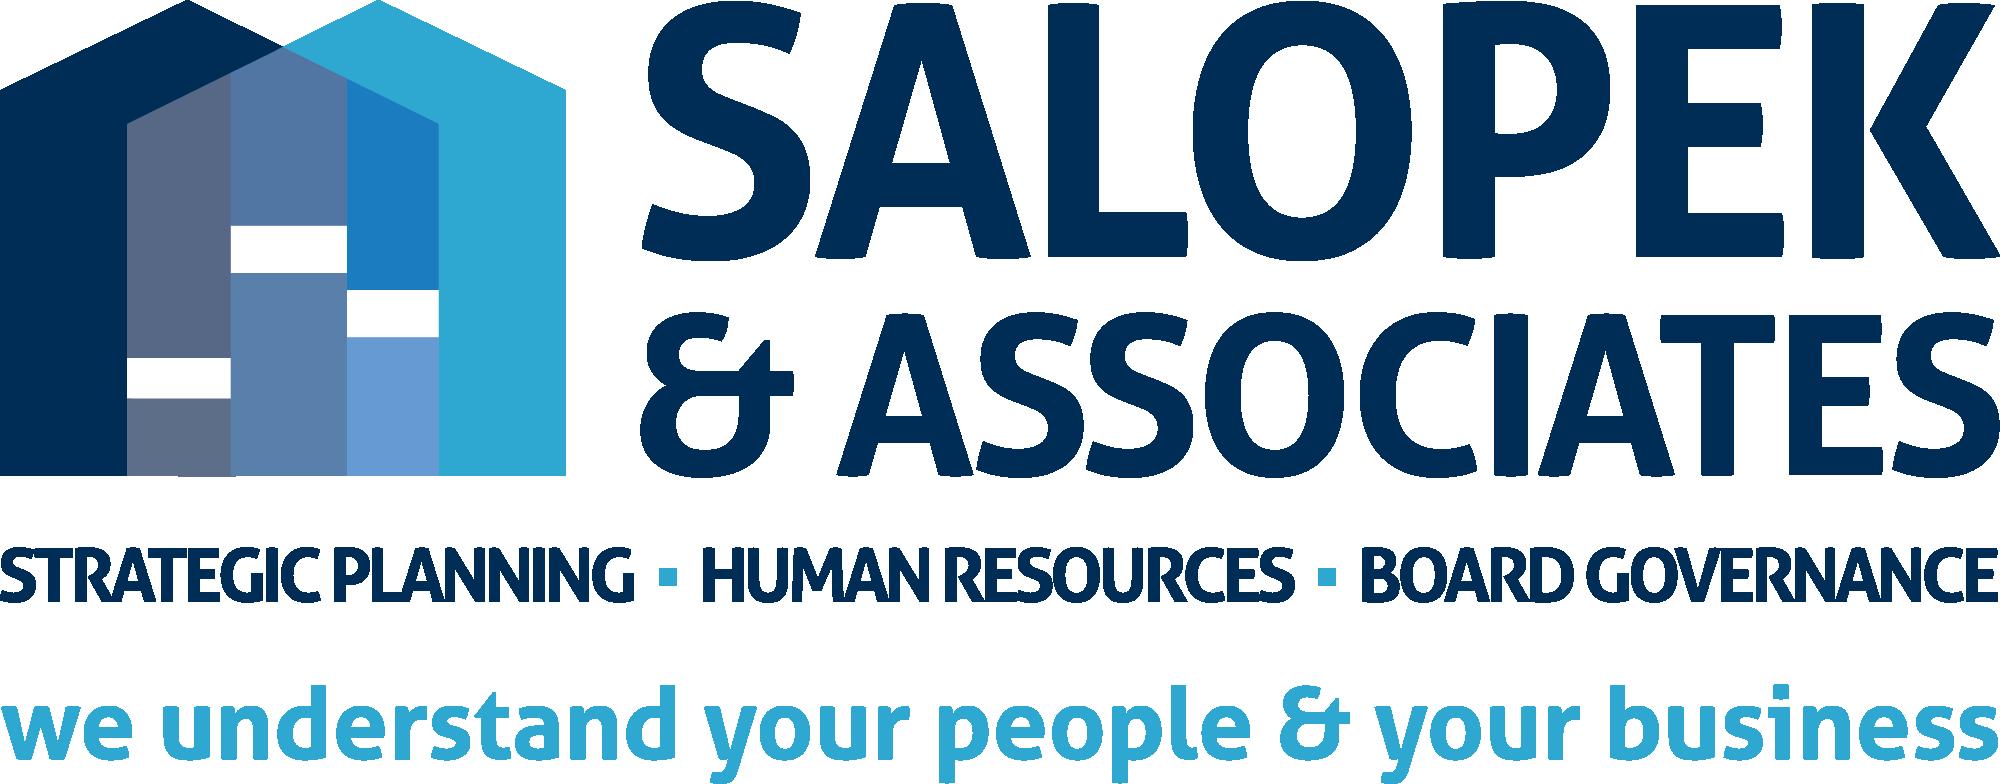 Salopek Logo